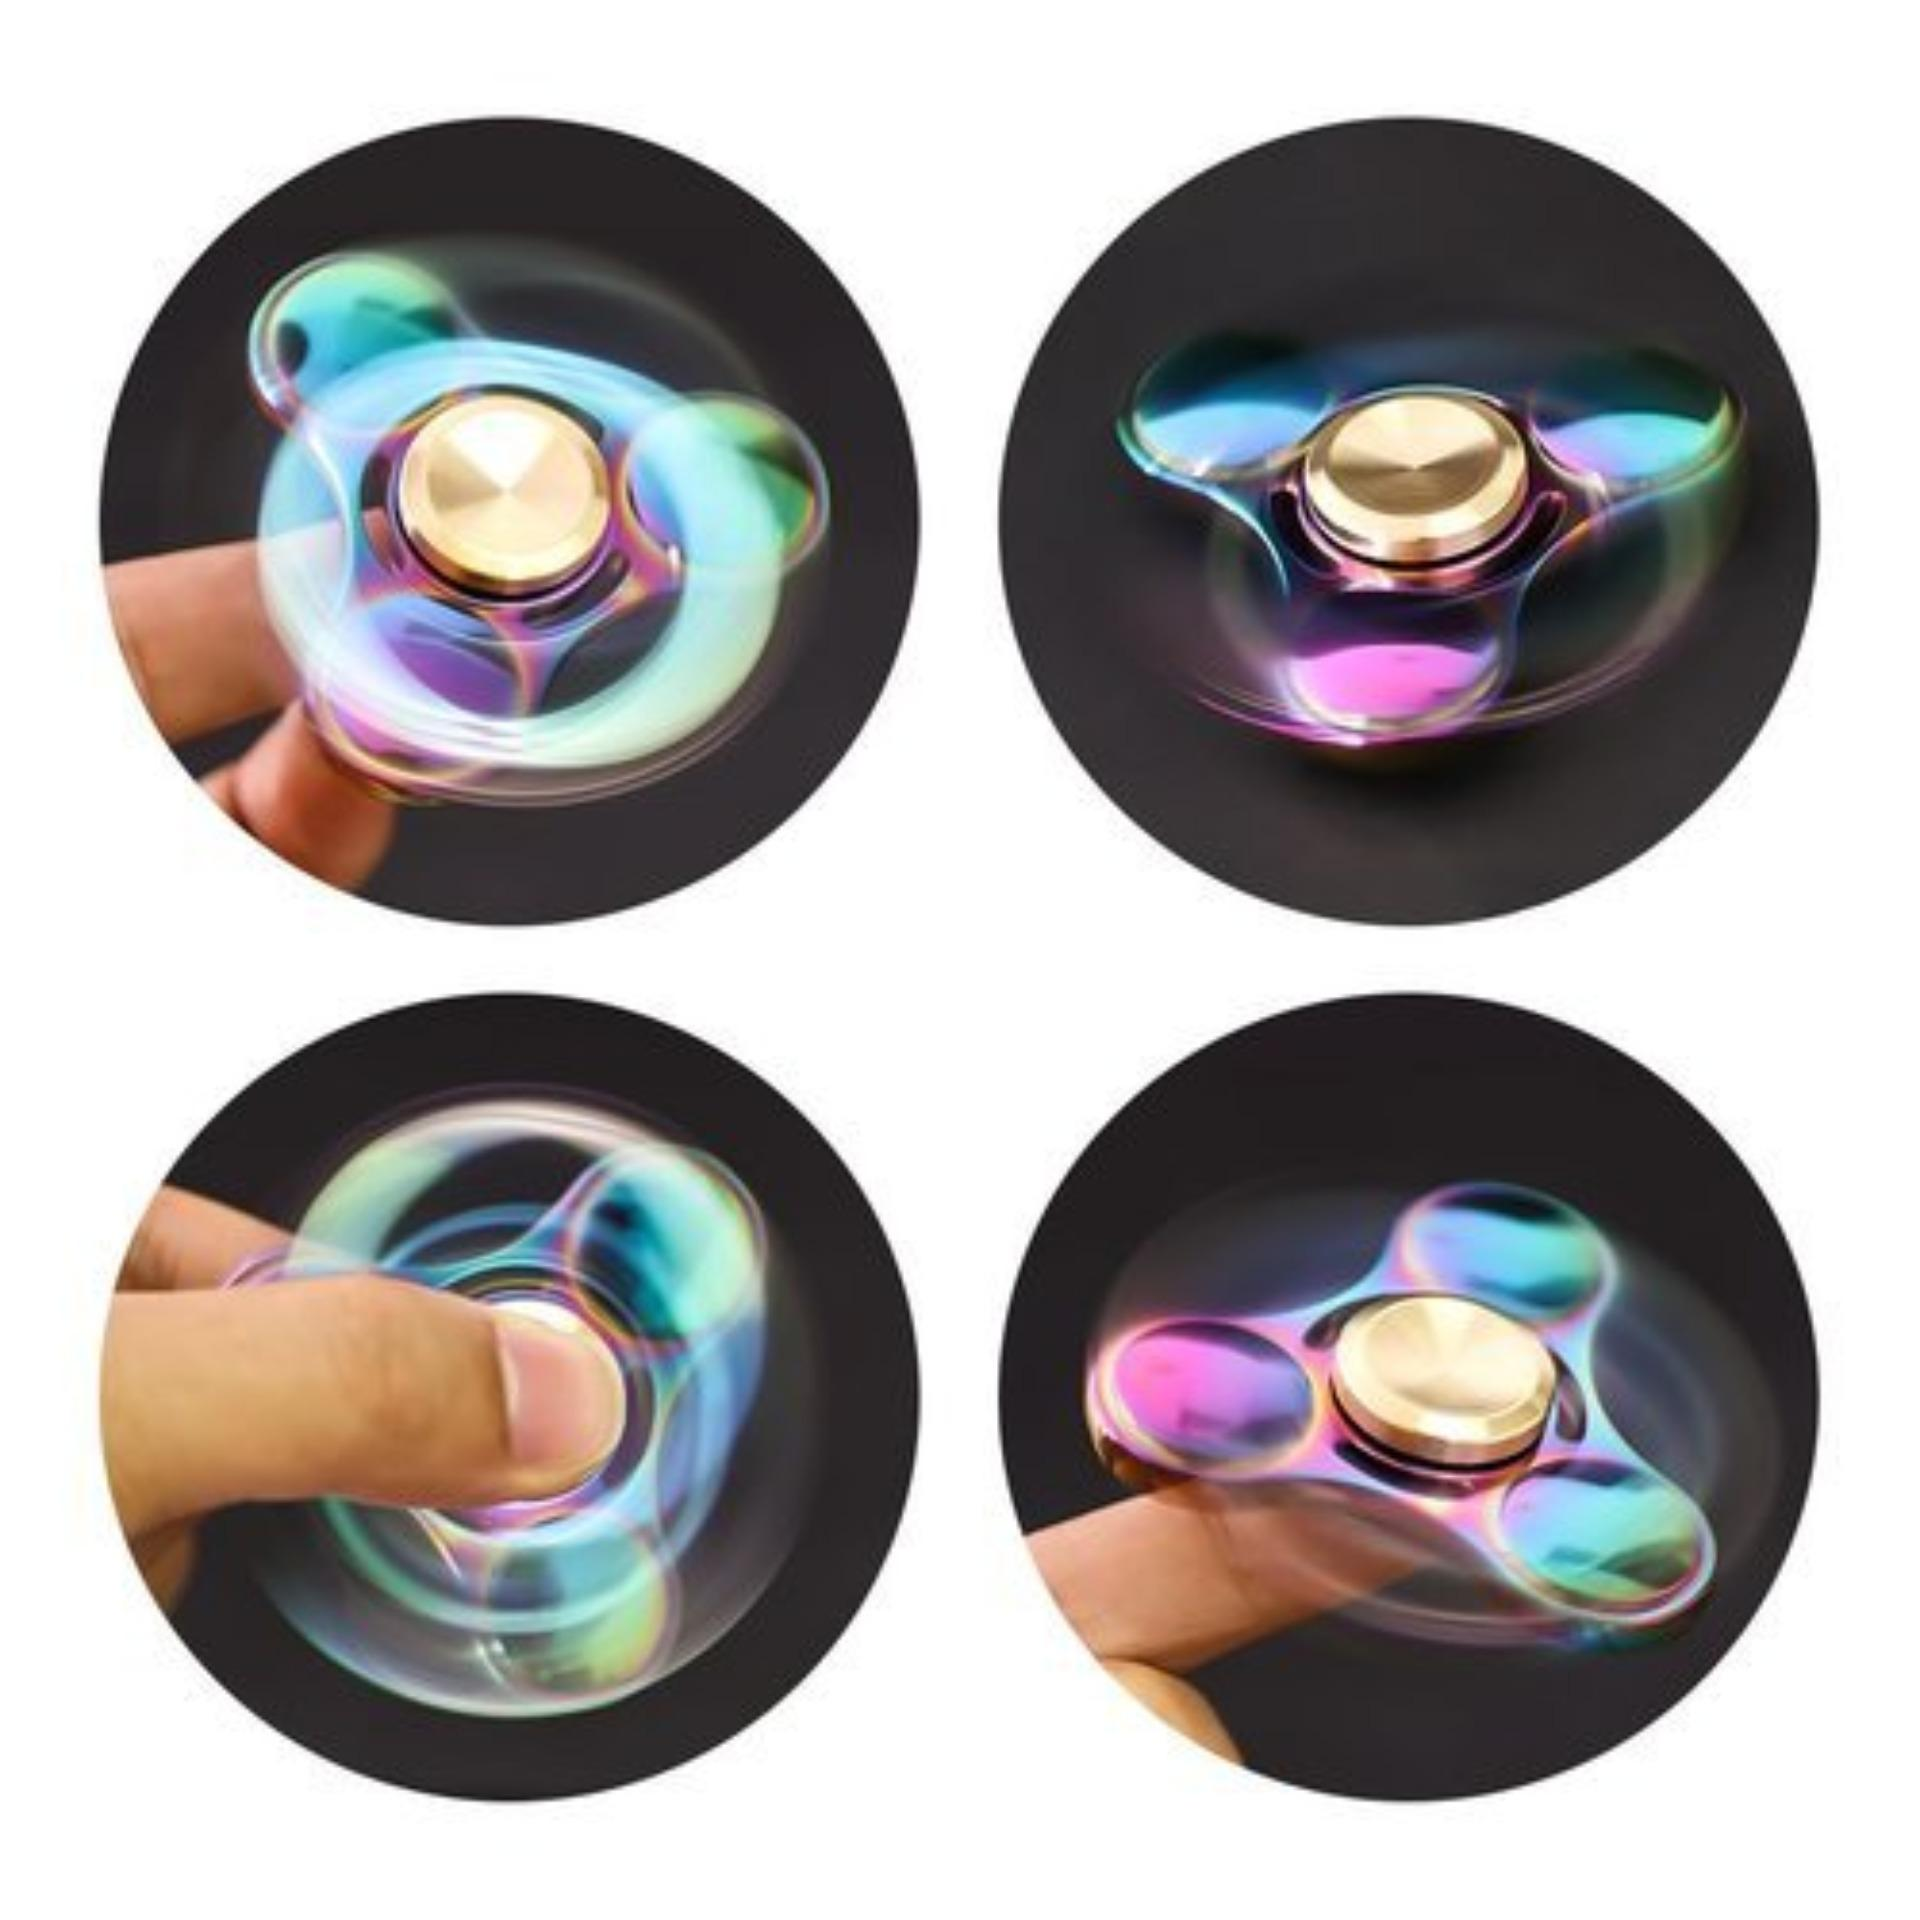 Hlj Spinner Fidget Rainbow Colorfull Edc Toy Hand Sohoku Mainan Anti Stress Model Batman Askey Premium Iridescent Series Limited Edition